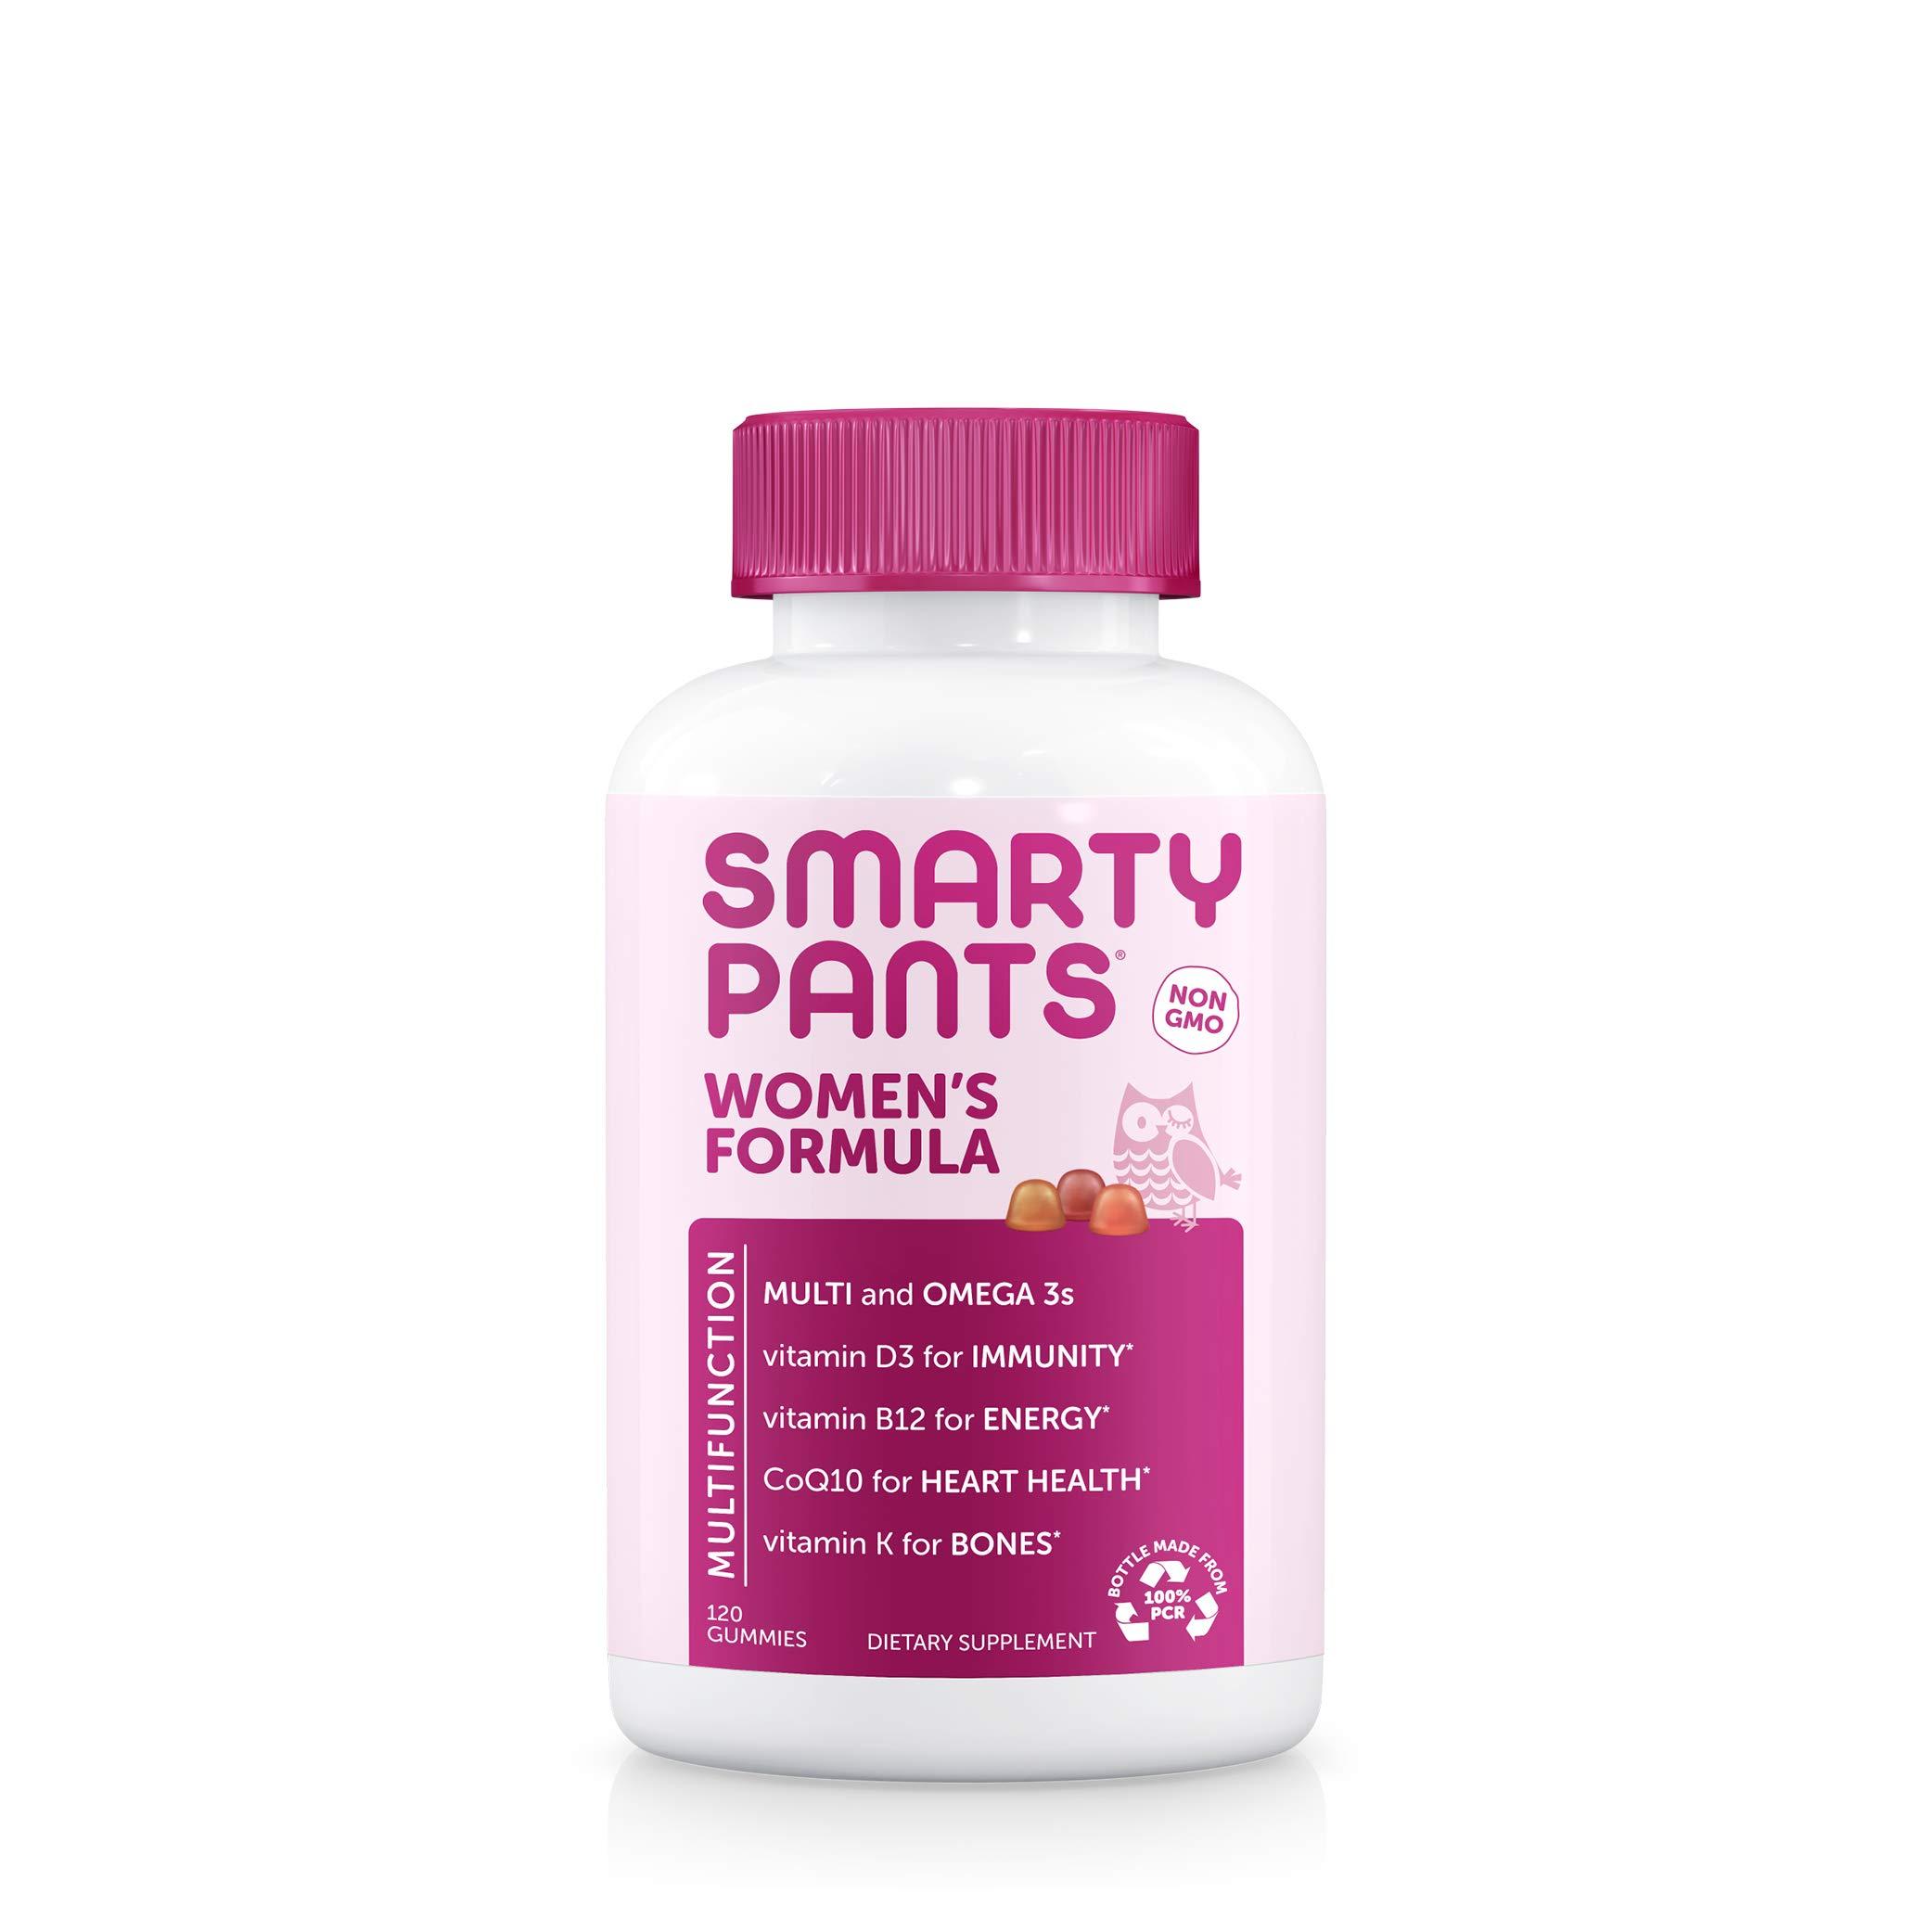 SmartyPants Women's Formula Daily Gummy Vitamins: Gluten Free